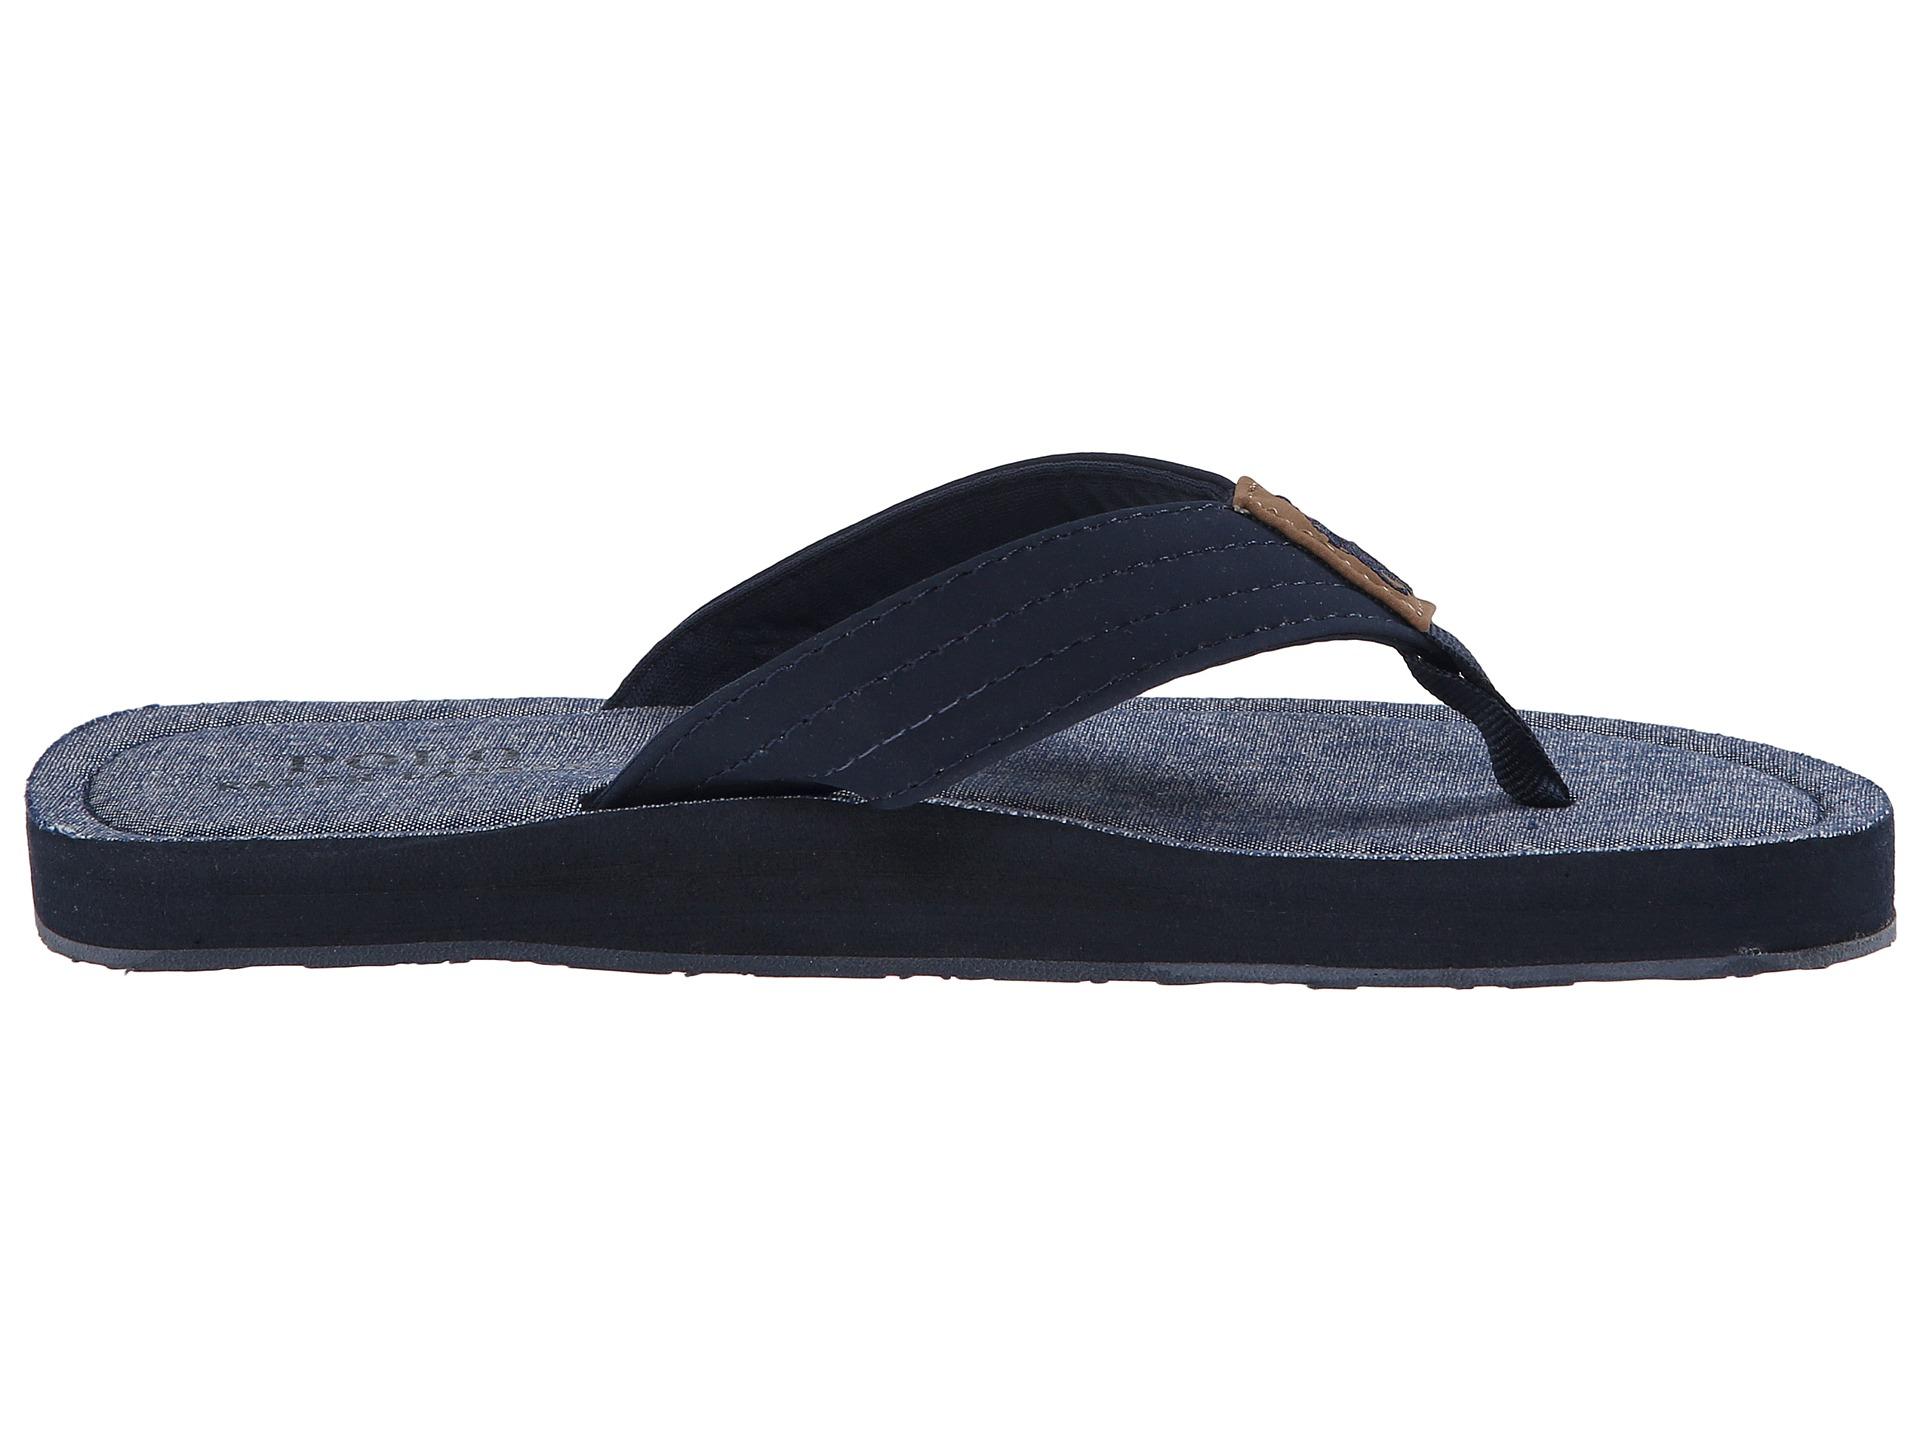 Branded Sandals For Men Images Junior Girls Silver Bow